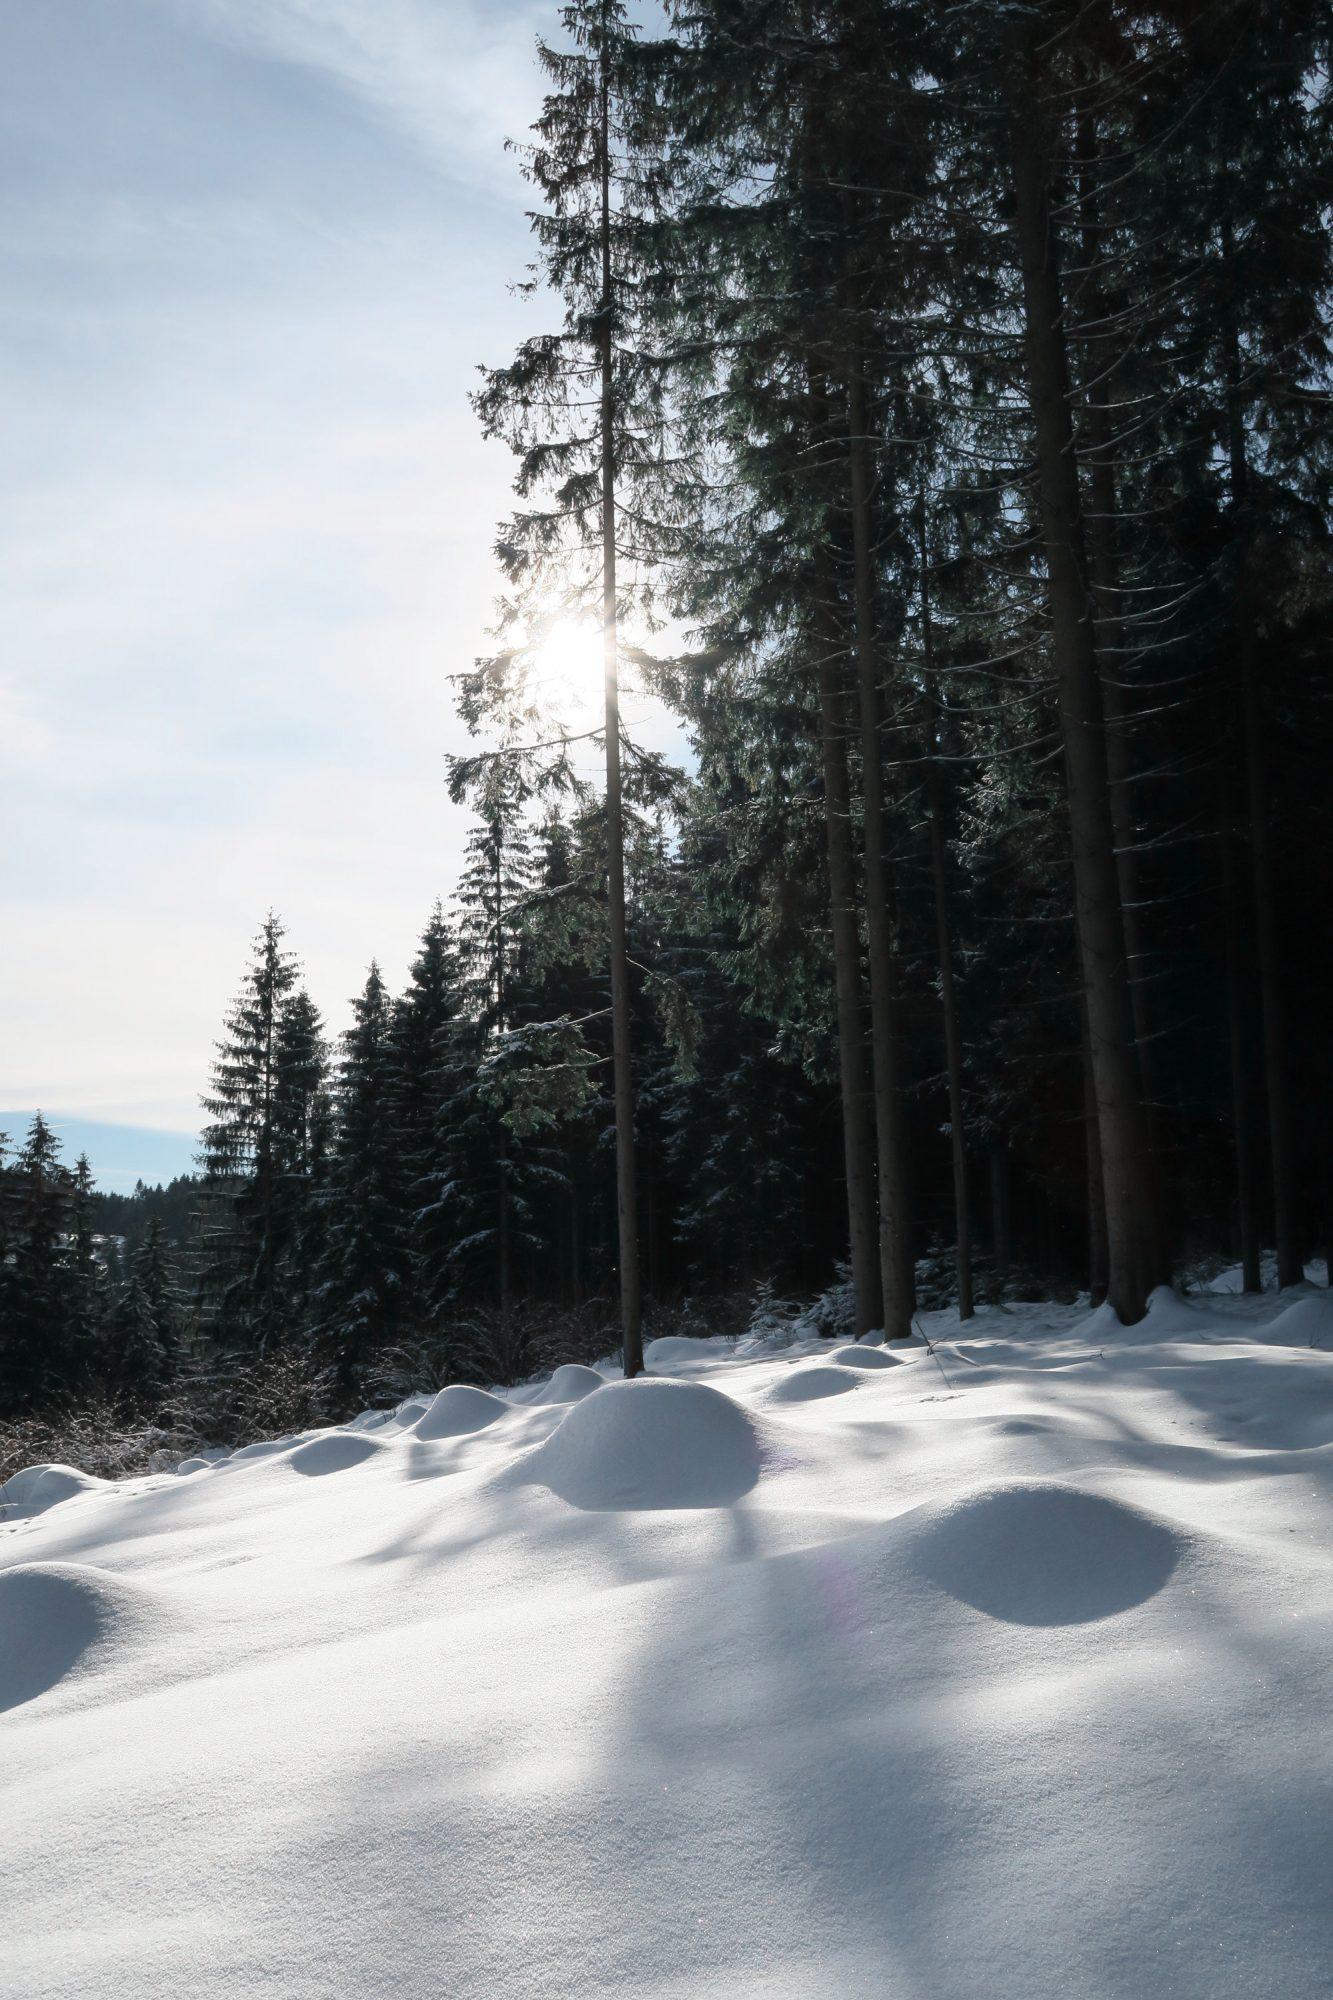 Märchenland auf dem Felsenweg im Winter. Winterwandern im Vogtland, Felsenweg, Grünbach